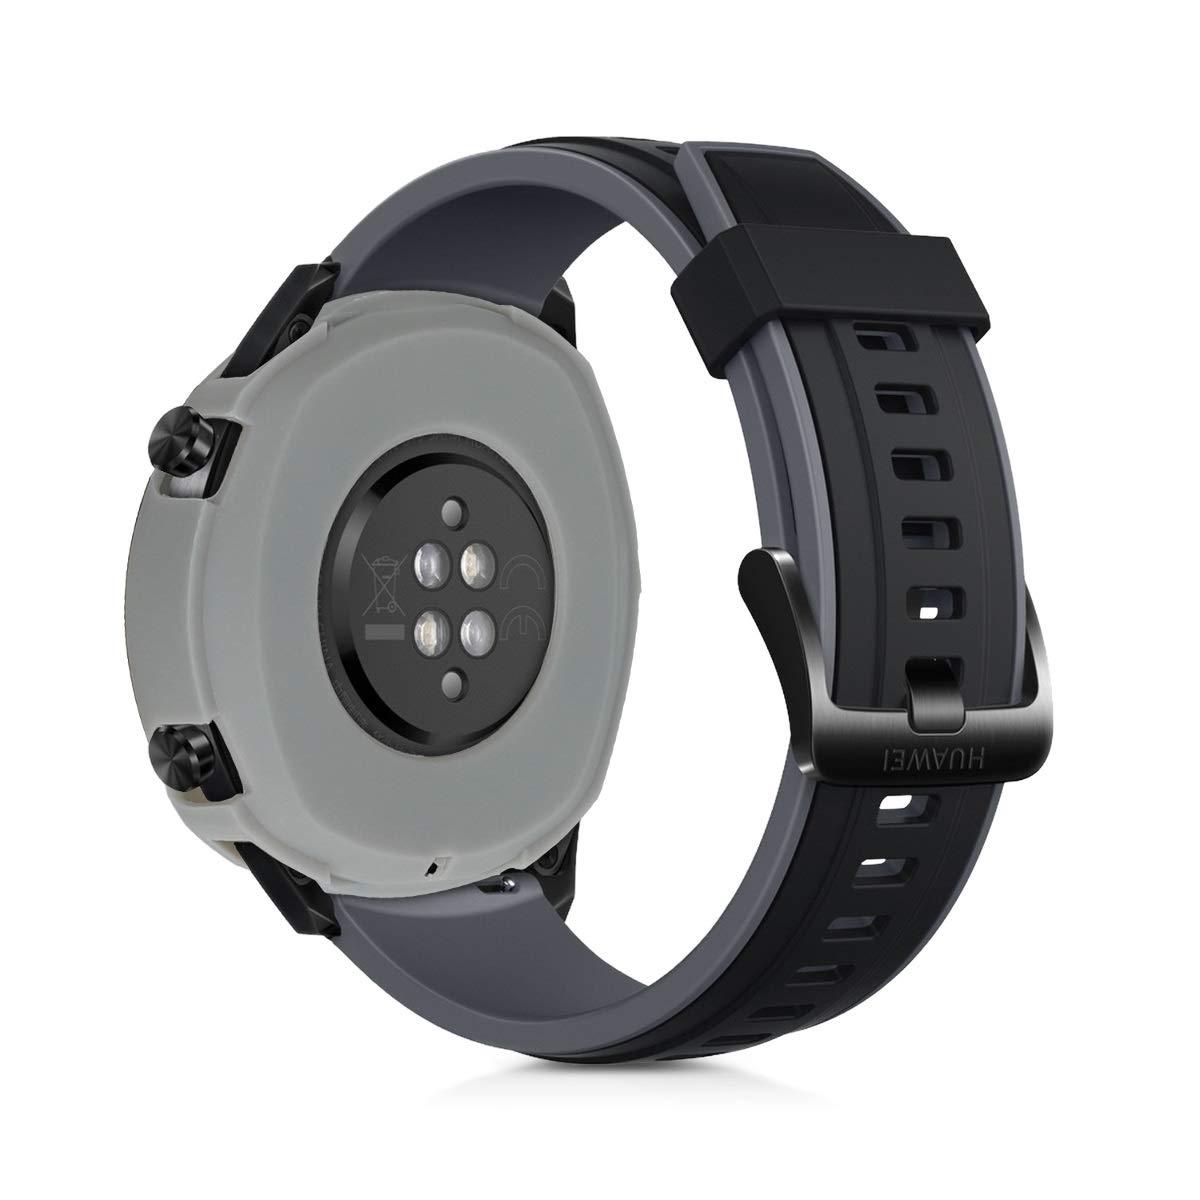 kwmobile 2 Fundas para Huawei Watch GT - Cubierta para Monitor de Actividad de Silicona - Case Negro/Gris